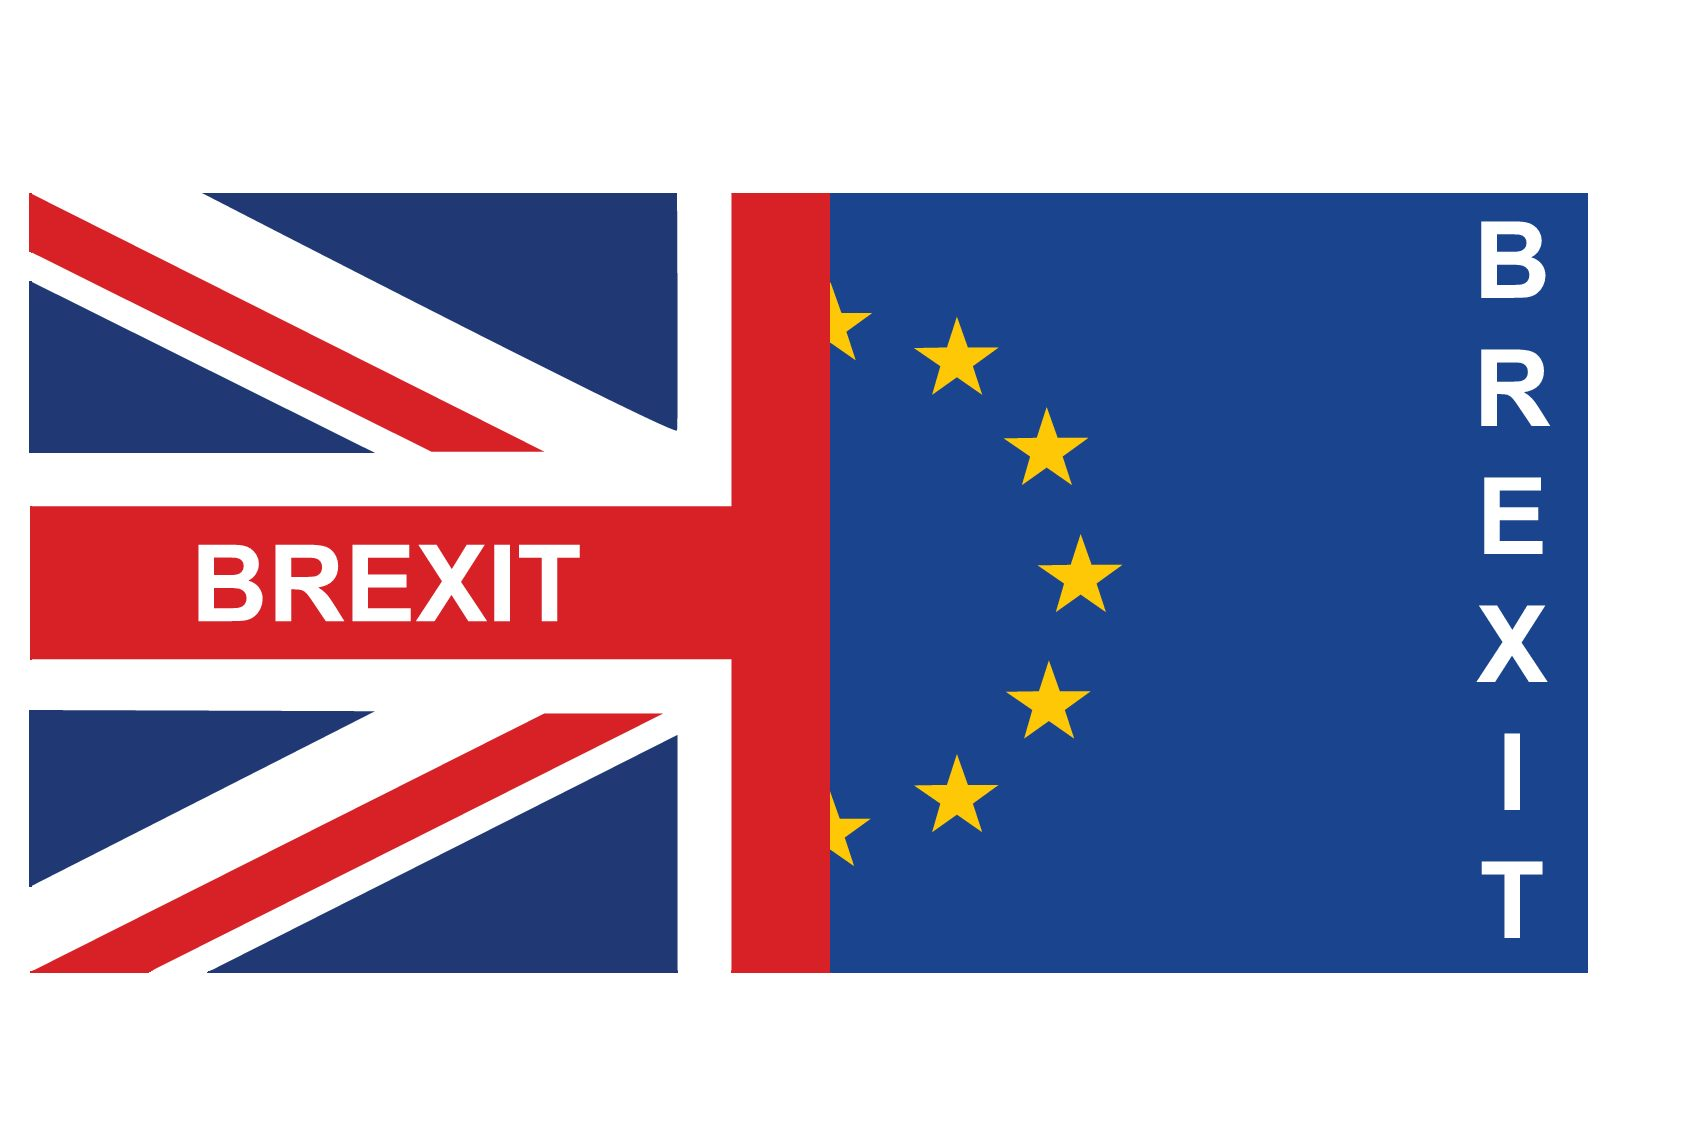 EJHP: Ciemna strona Brexitu